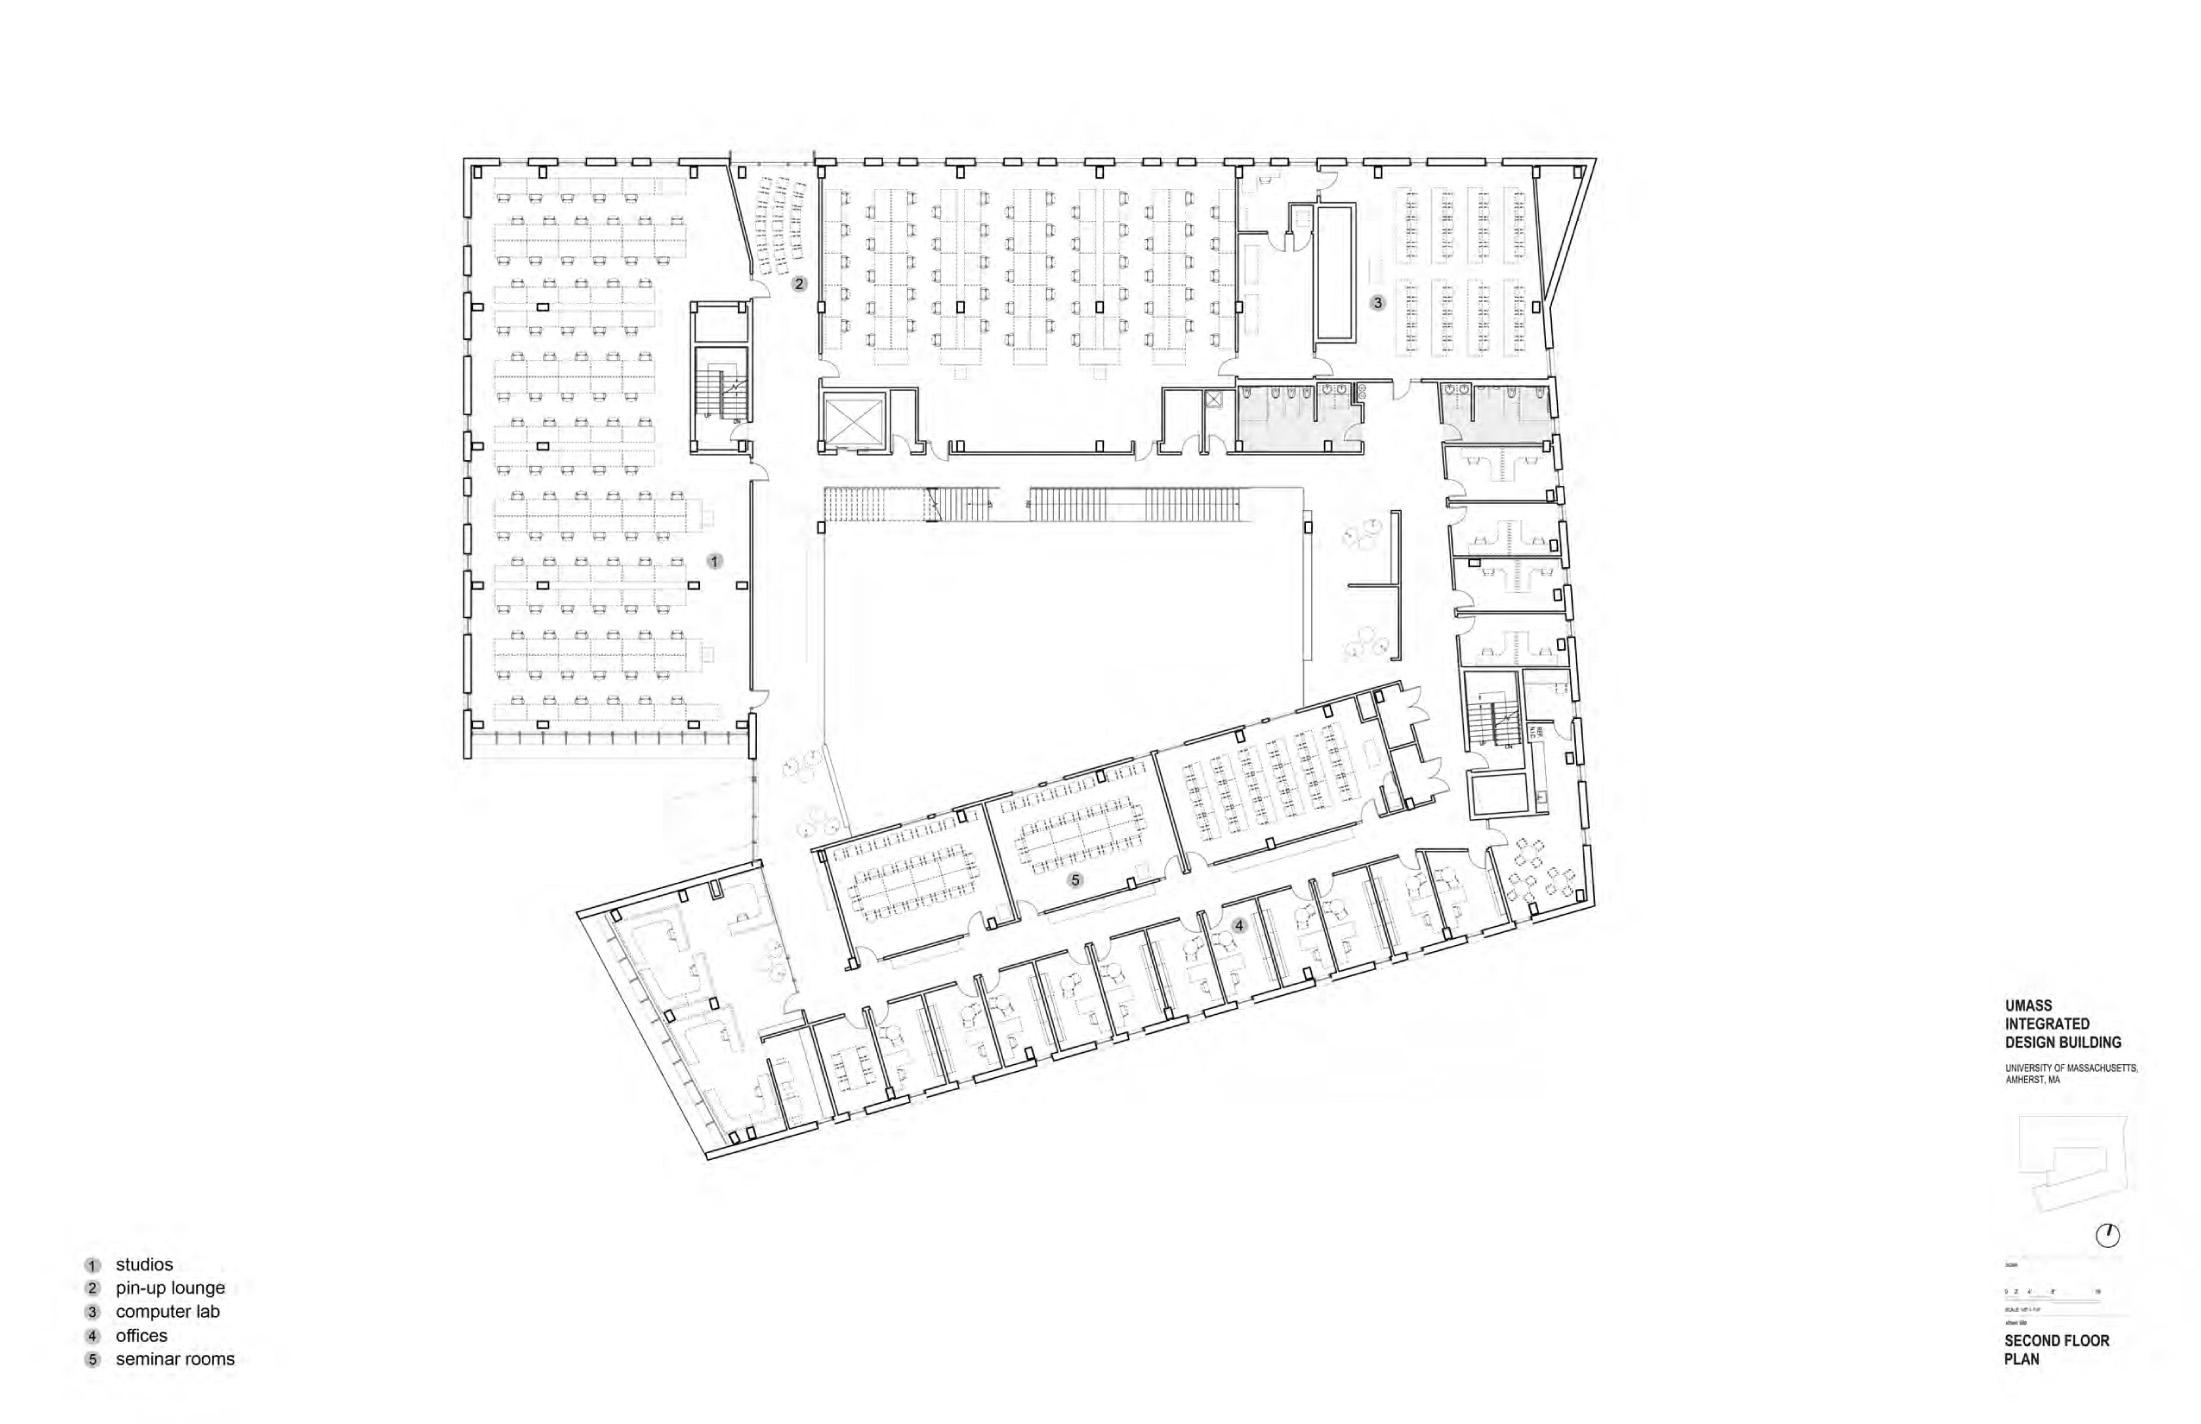 DB Second Floor